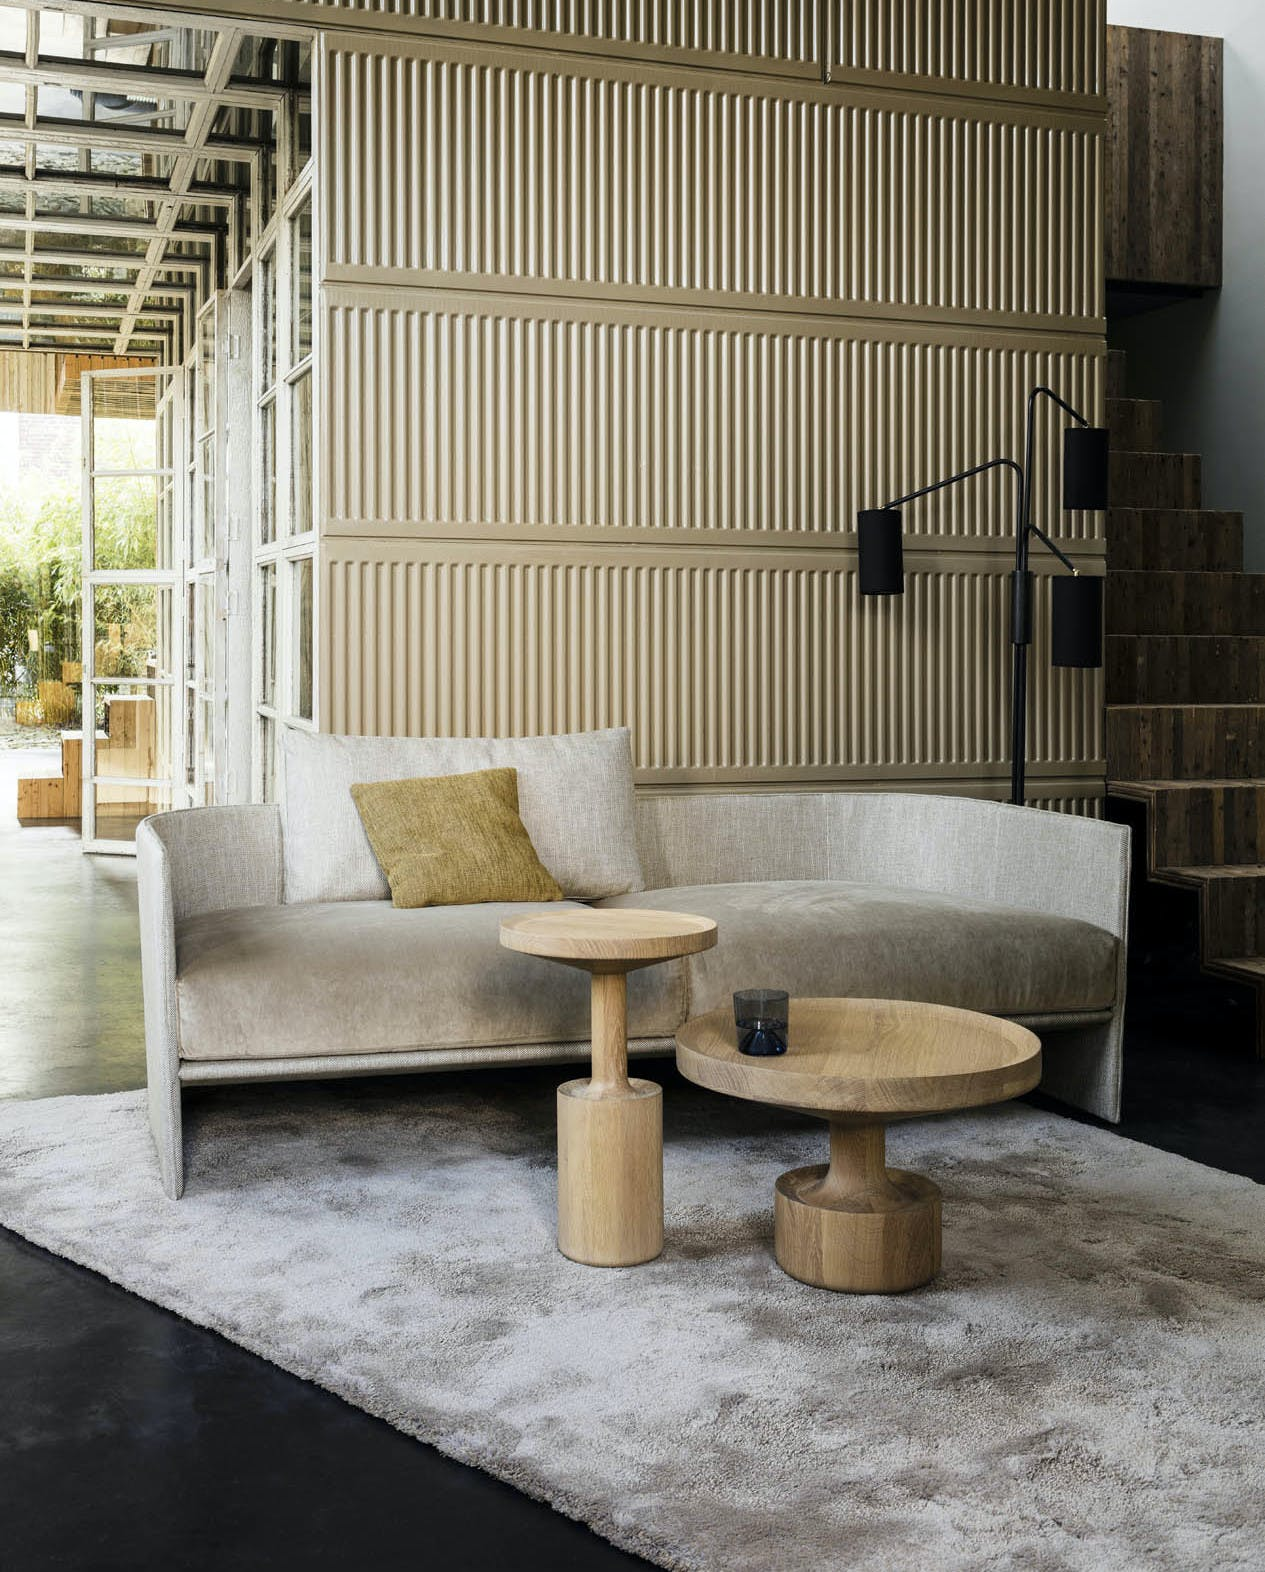 Linteloo-front-small-highline-sofa-institu-haute-living